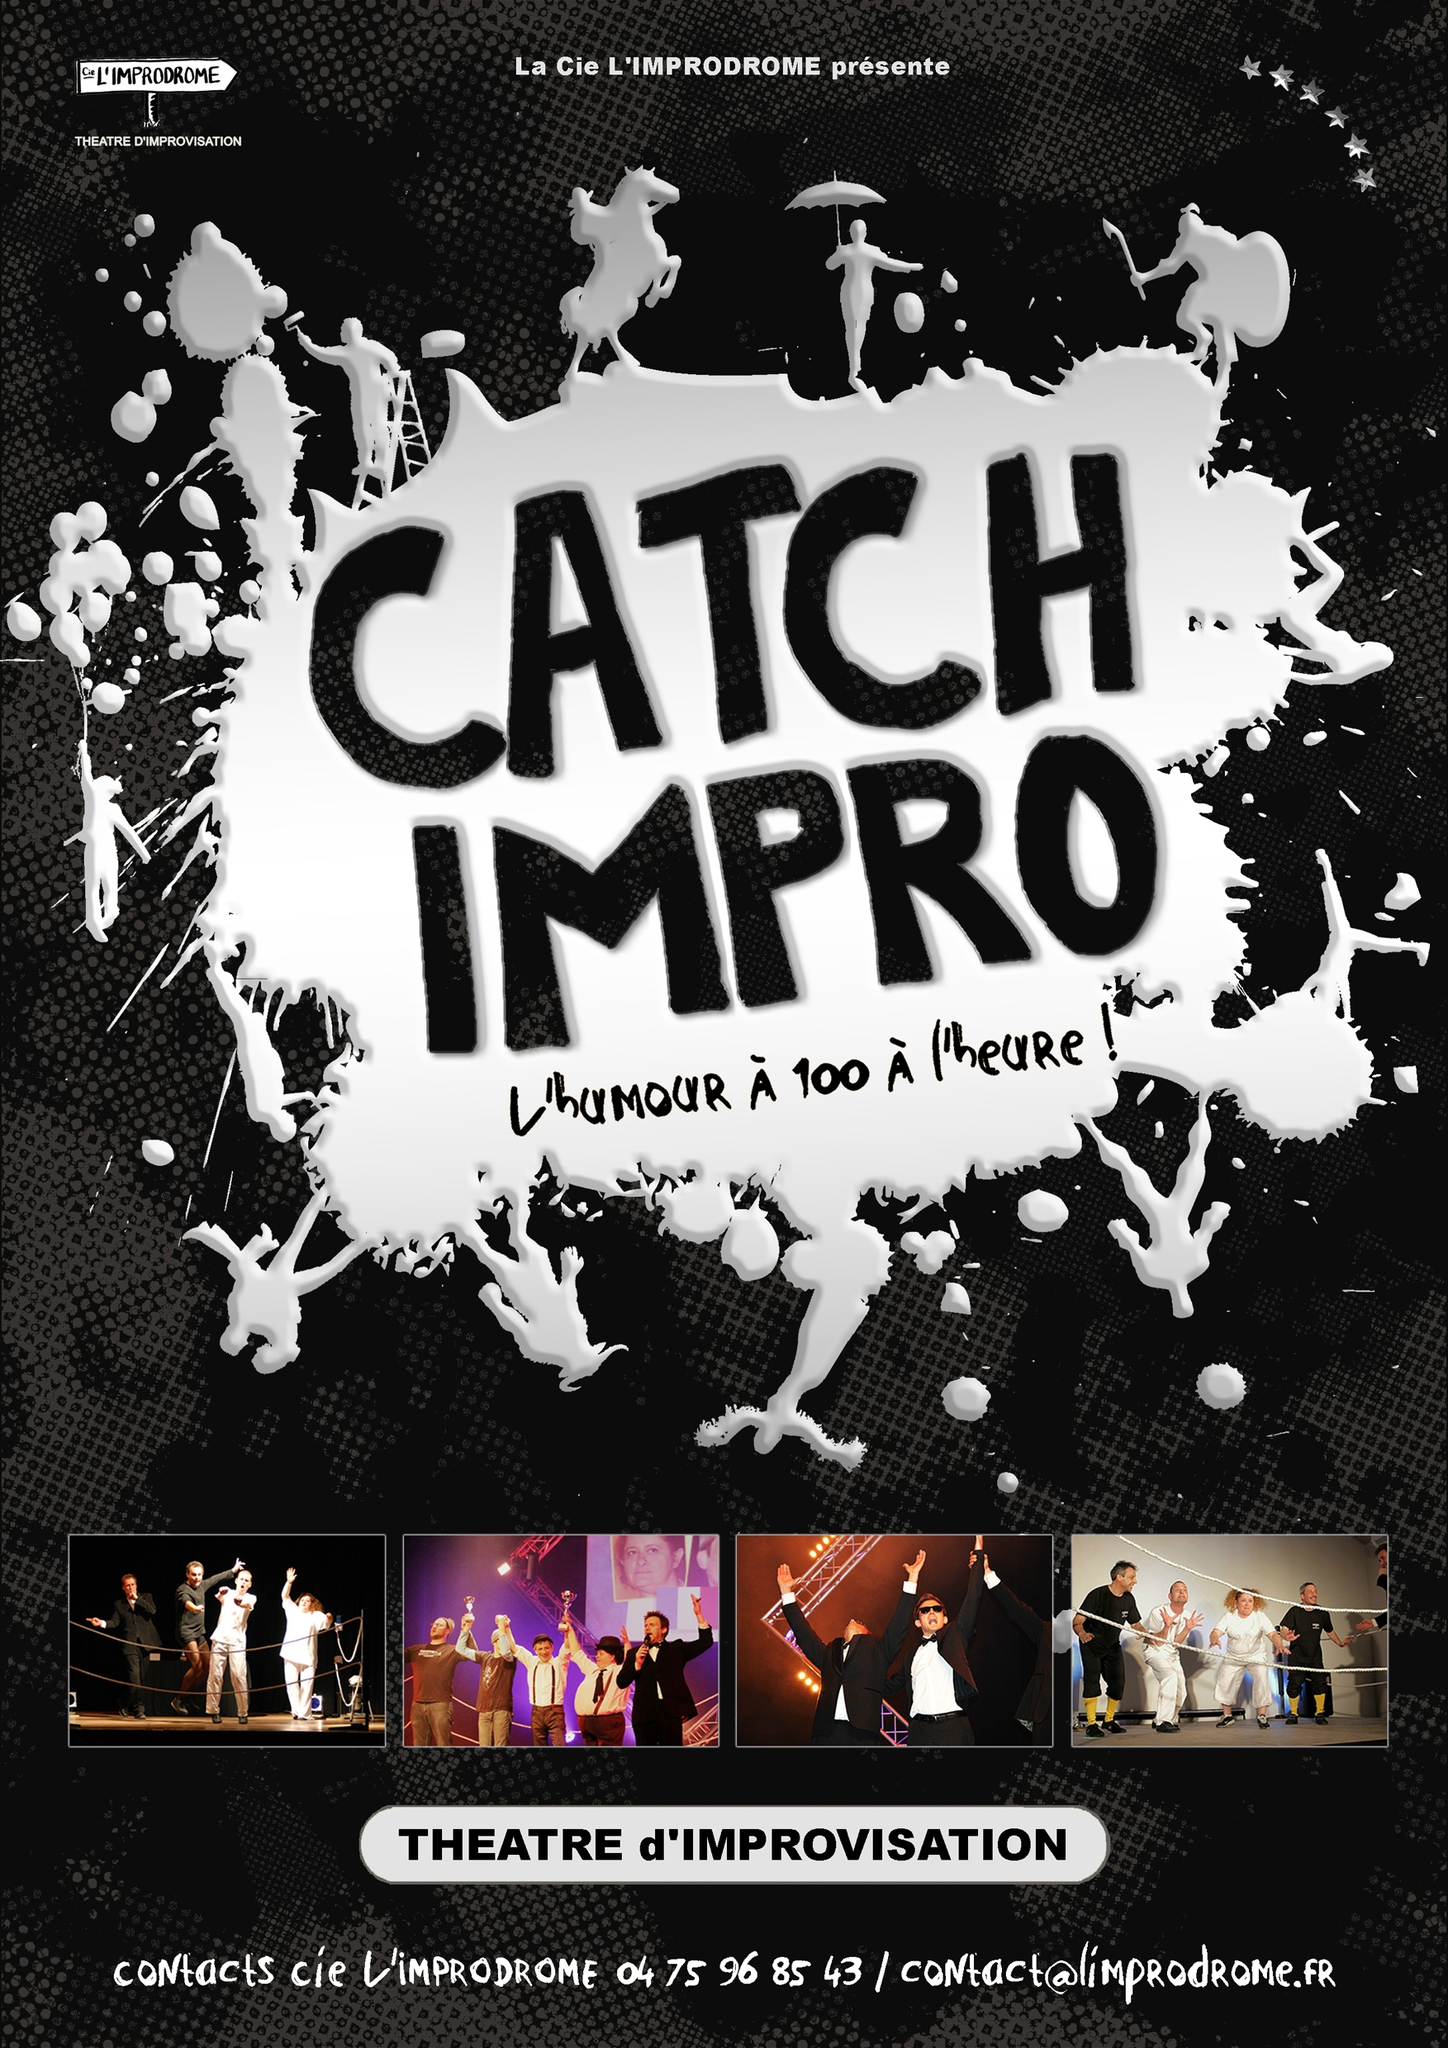 Catch-Impro 2015 p1